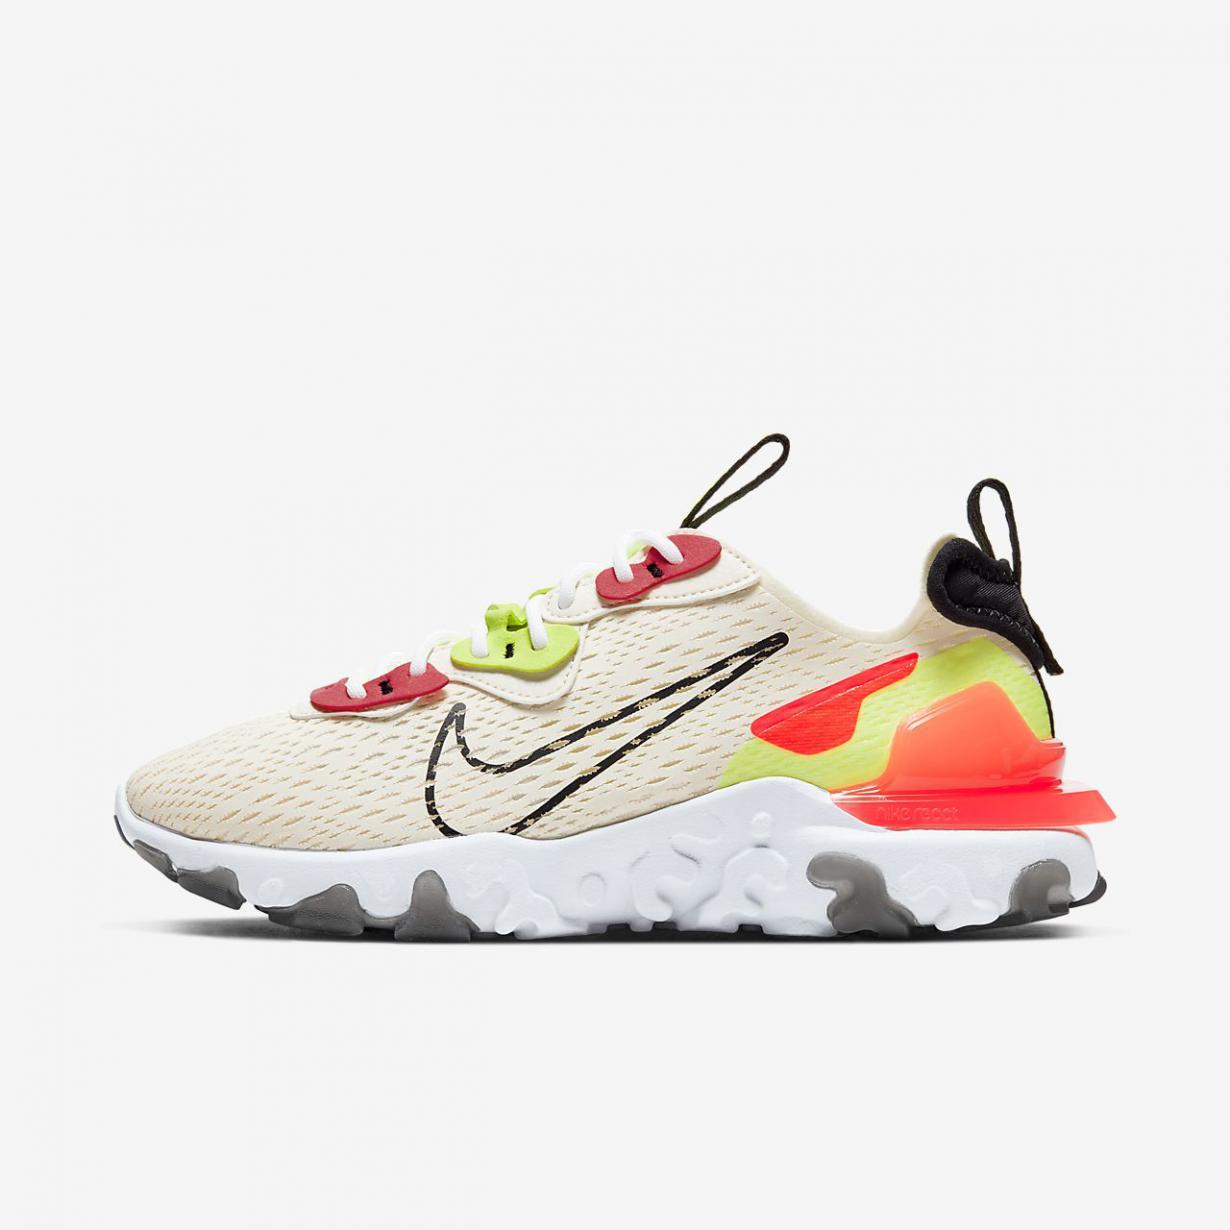 Lifestyle Femme   React Vision Ivoire Pâle/Volt/Cramoisi laser/Noir   Nike < Gooddaytricities